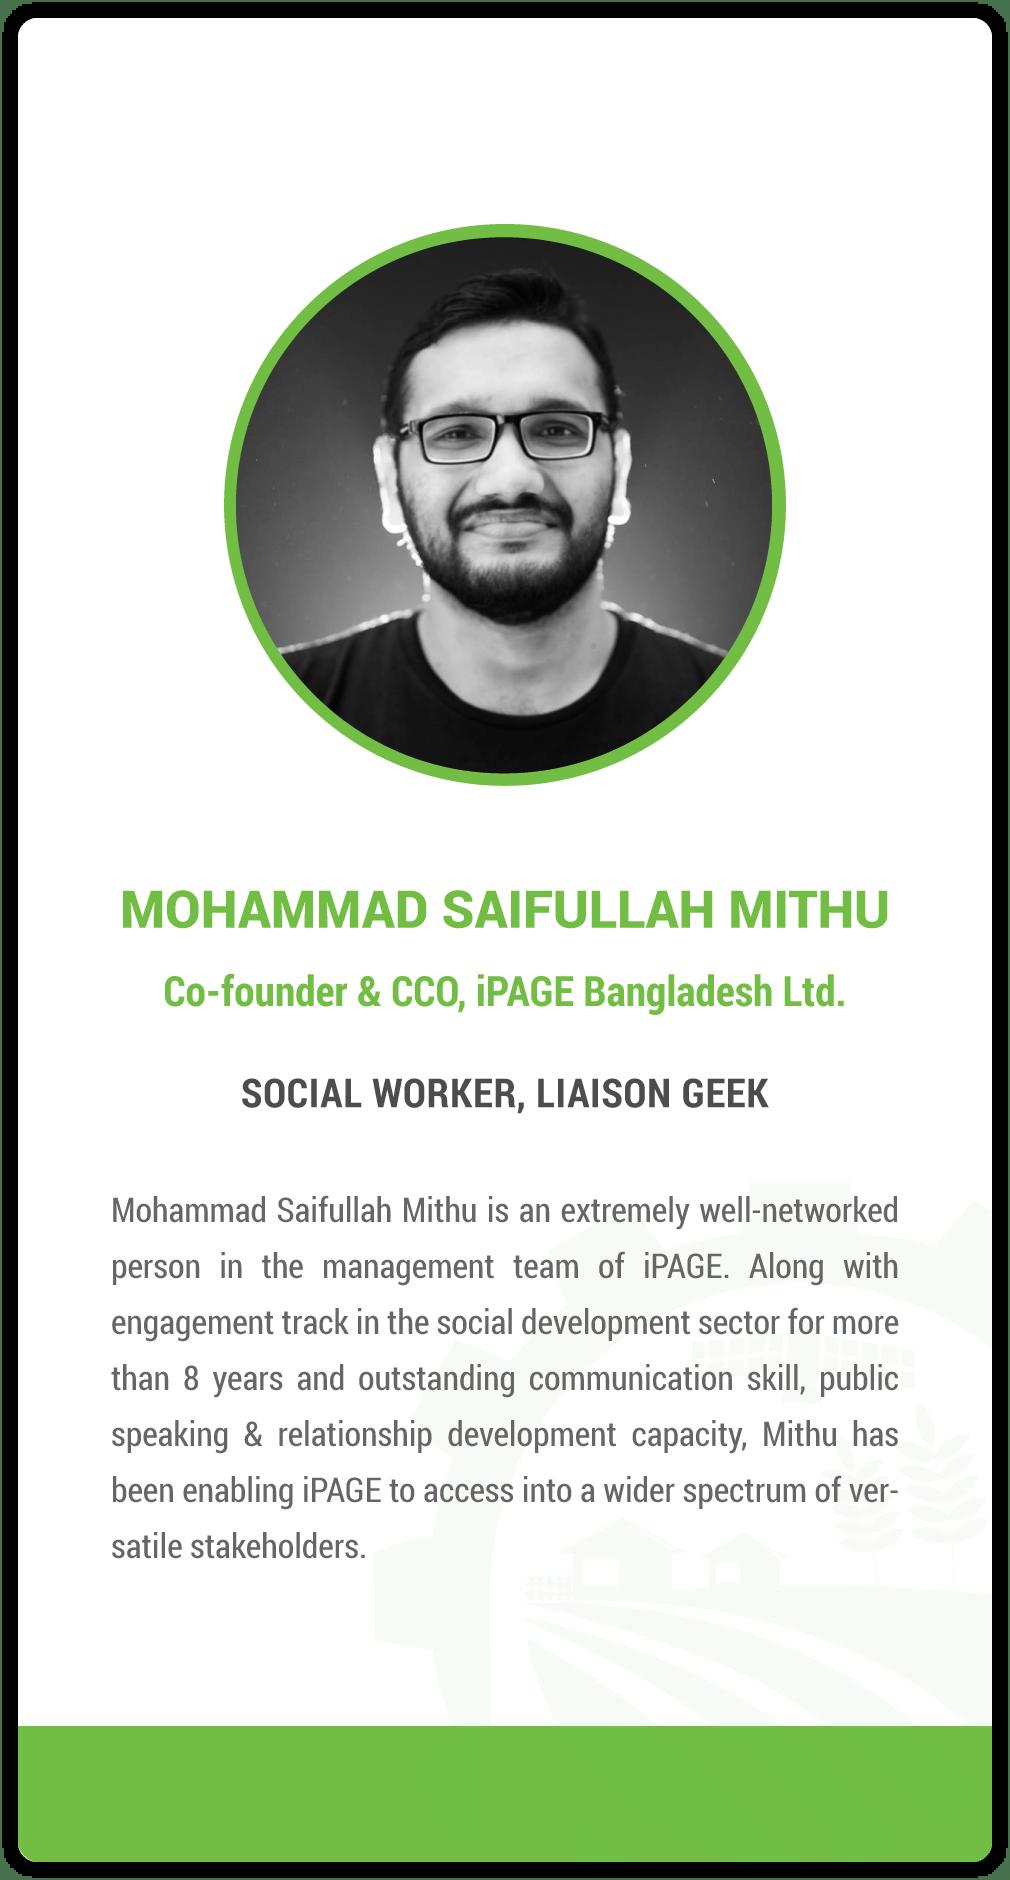 Mohammad Saifullah Mithu